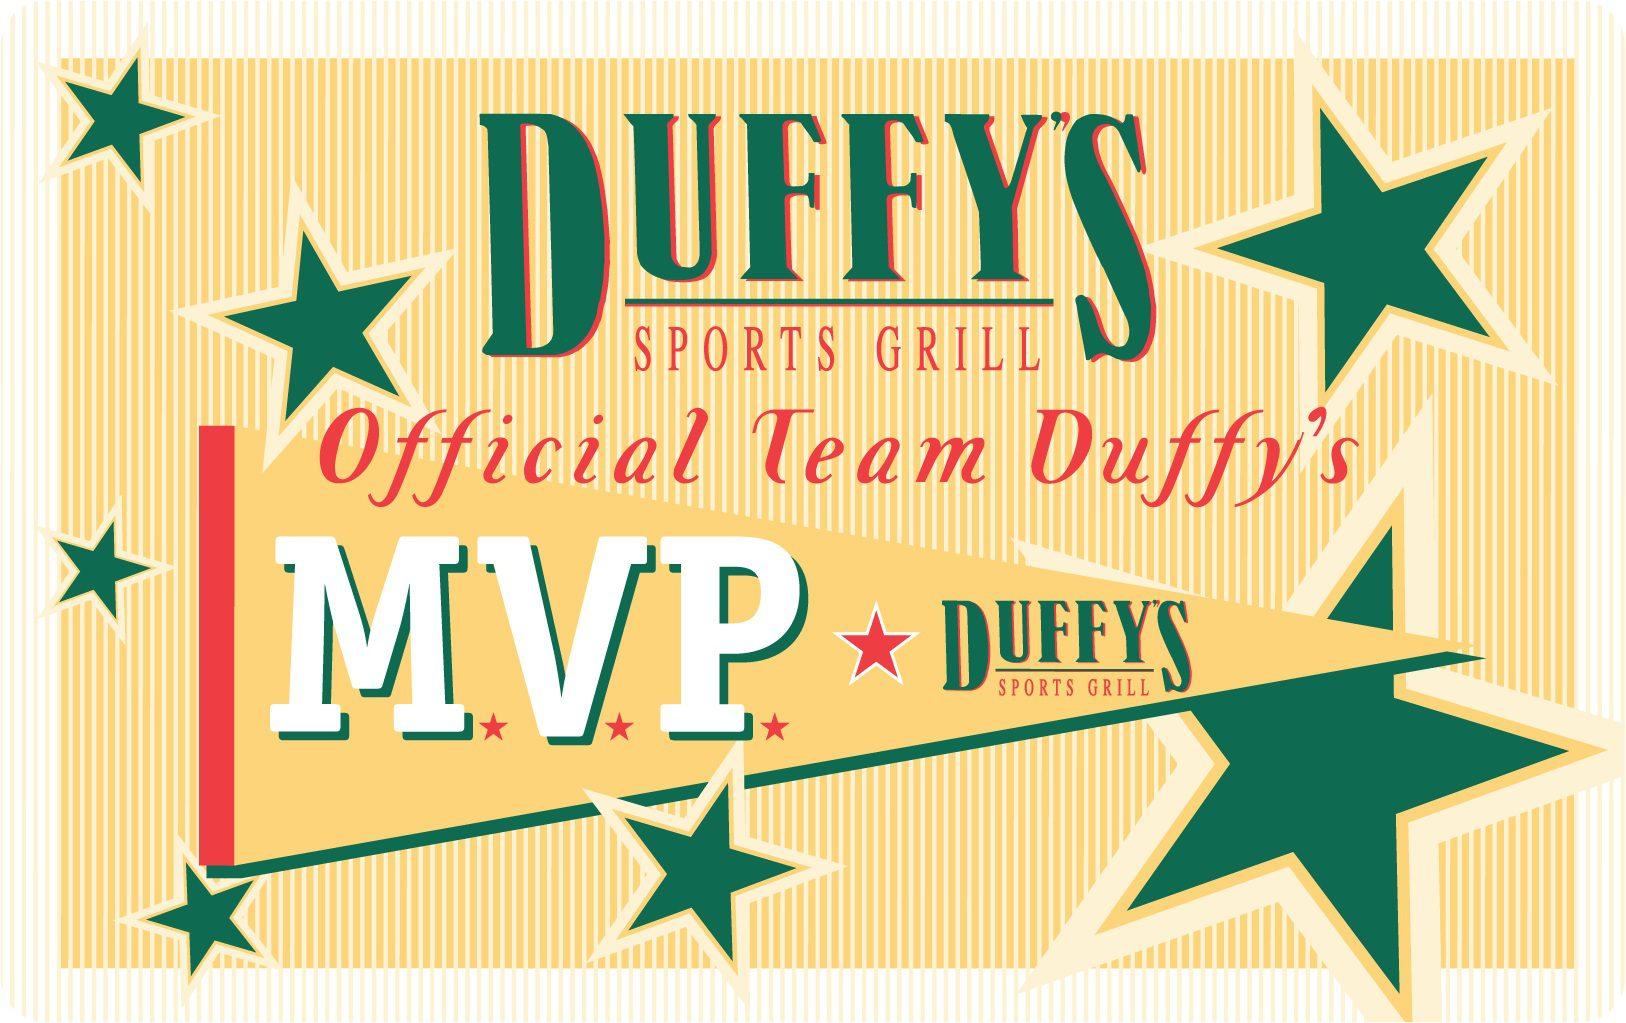 Duffys (2)